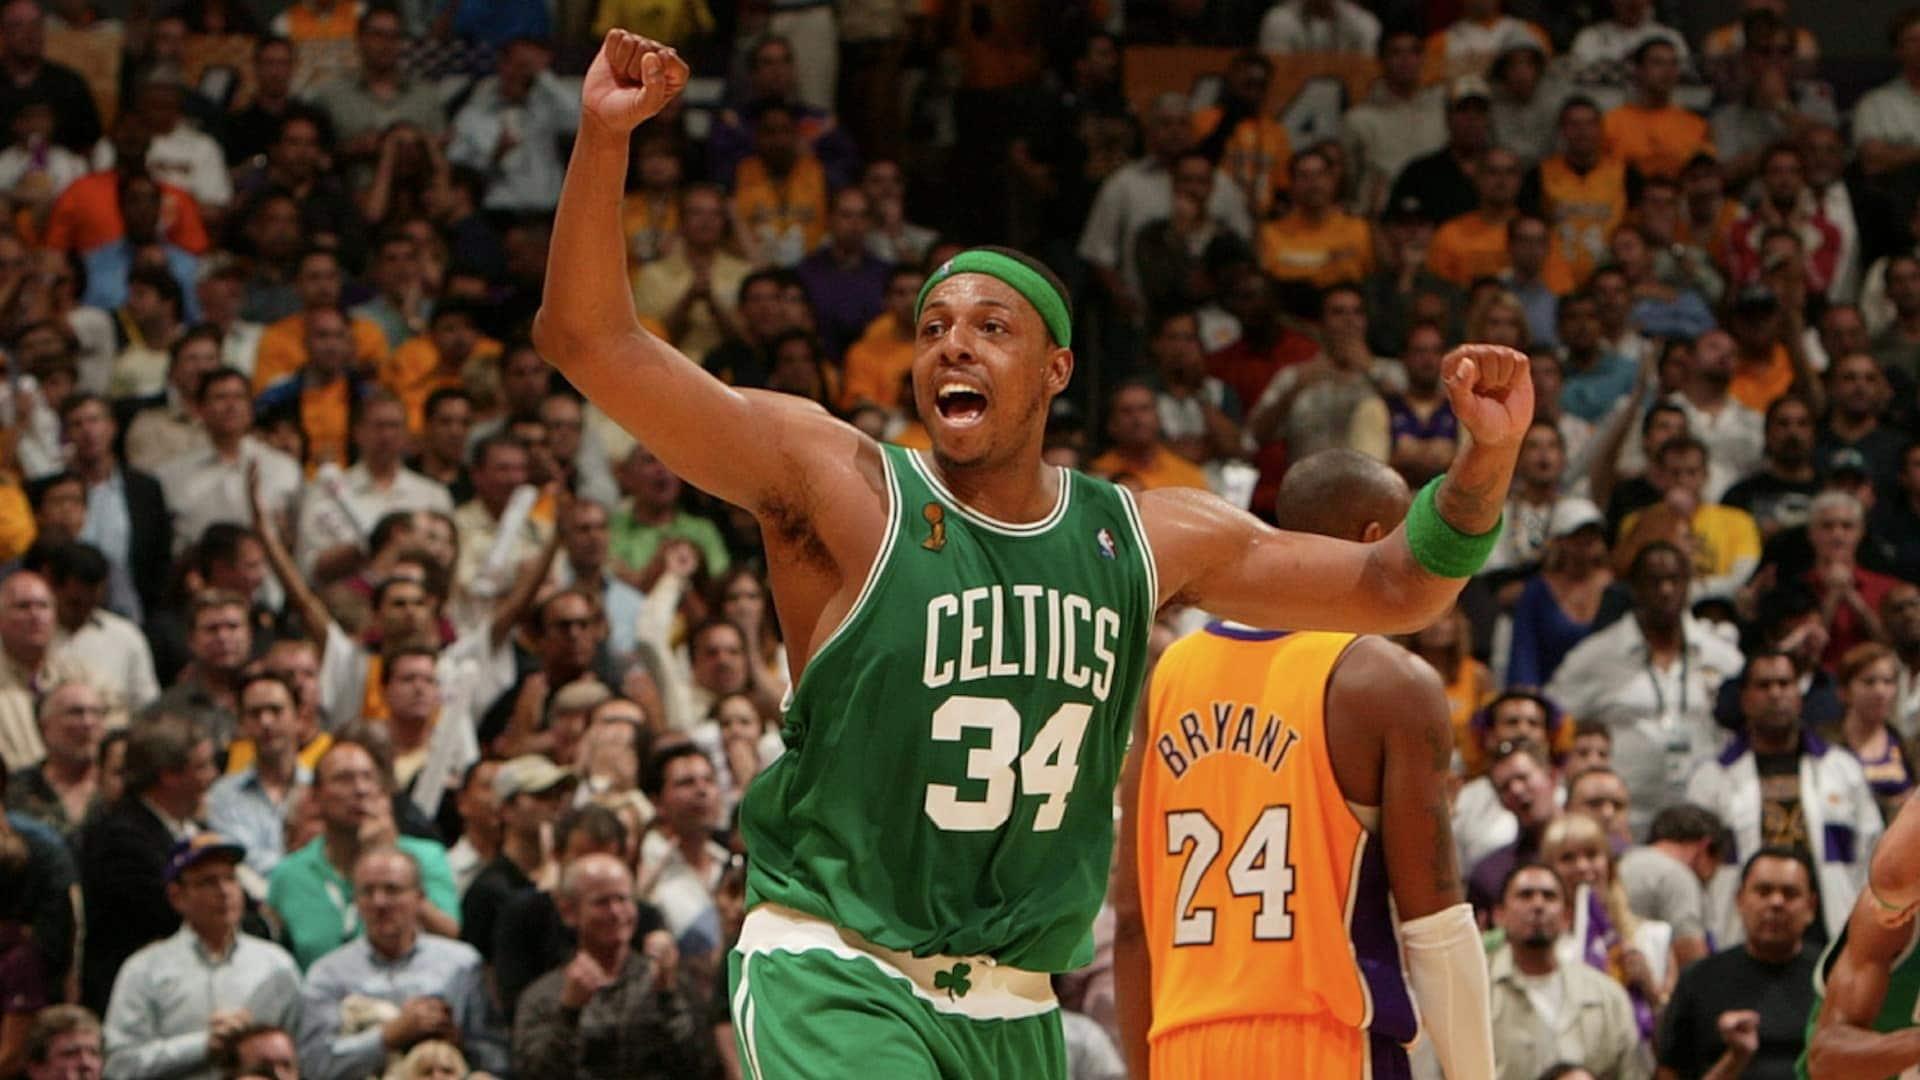 Top NBA Finals moments: Celtics' epic comeback in Game 4